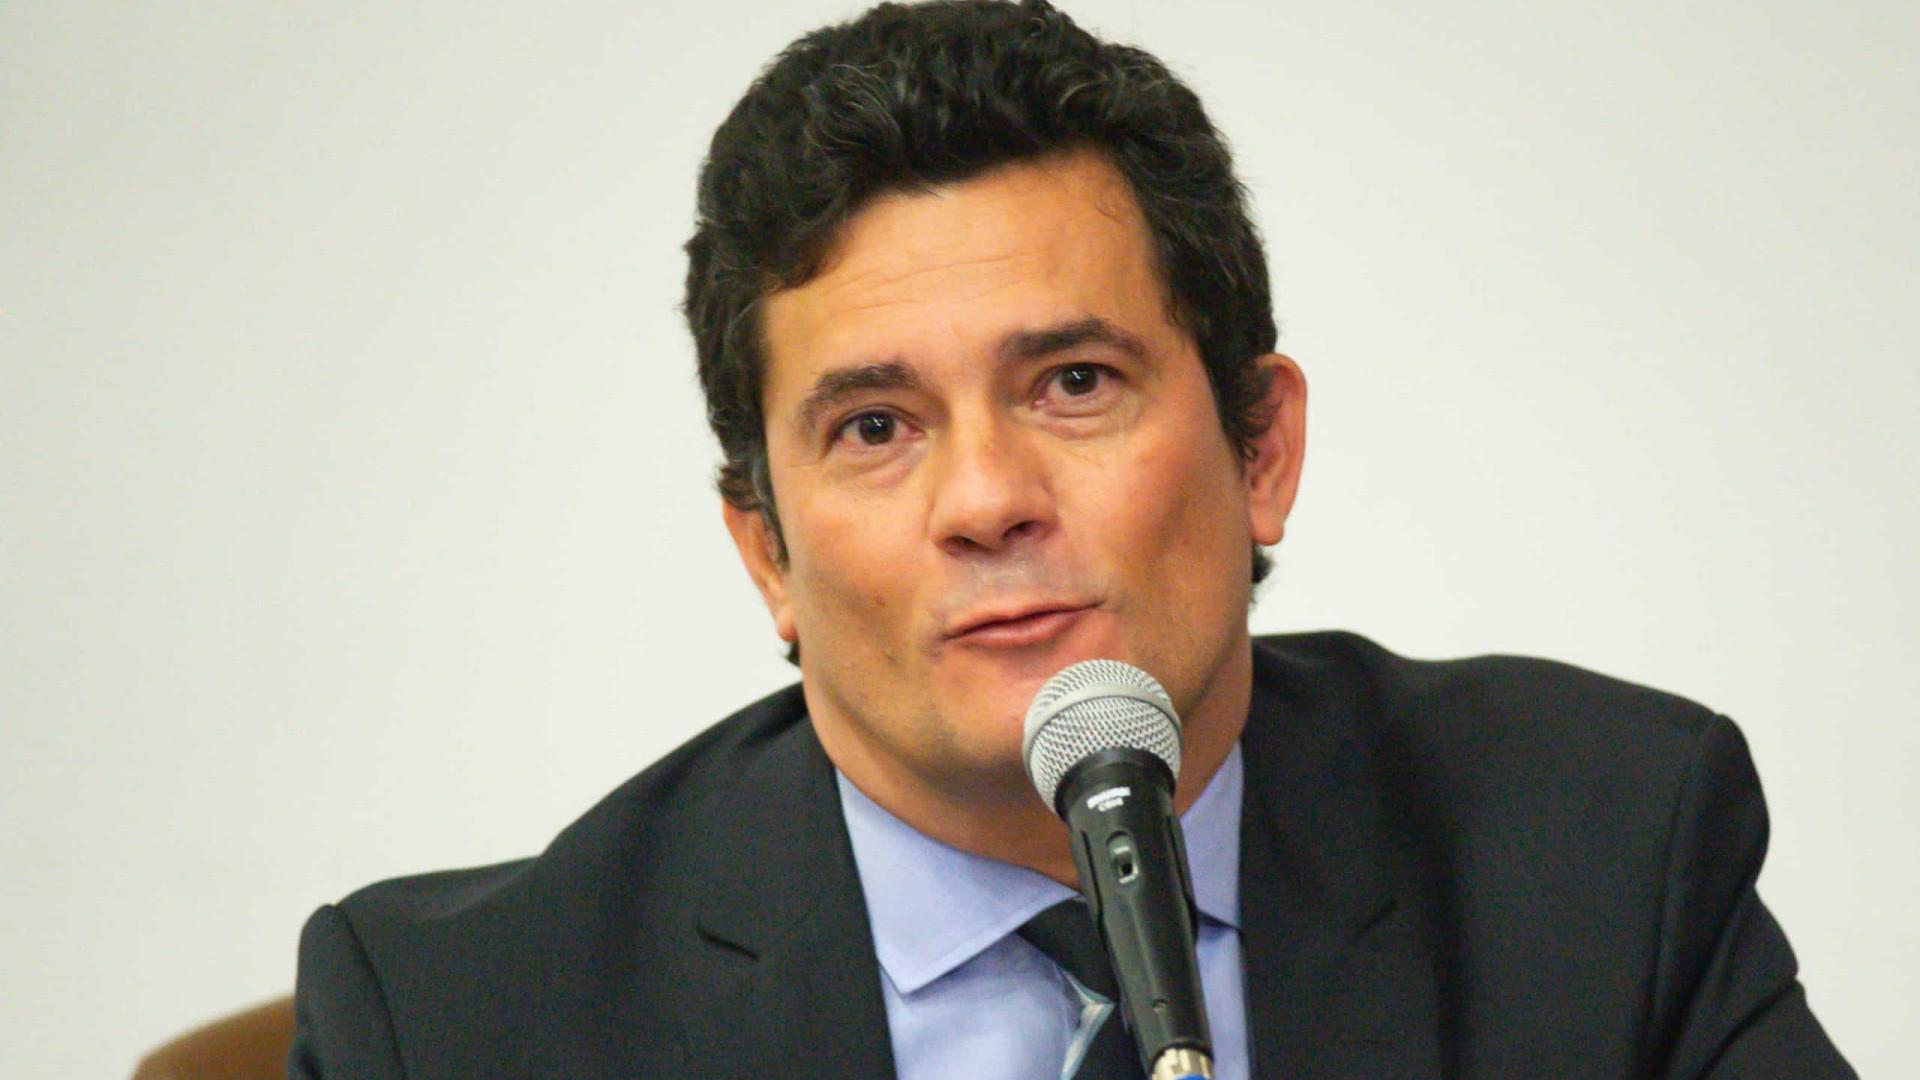 Moro: sensacionalismo de mensagens da Lava Jato favoreceram criminosos condenados